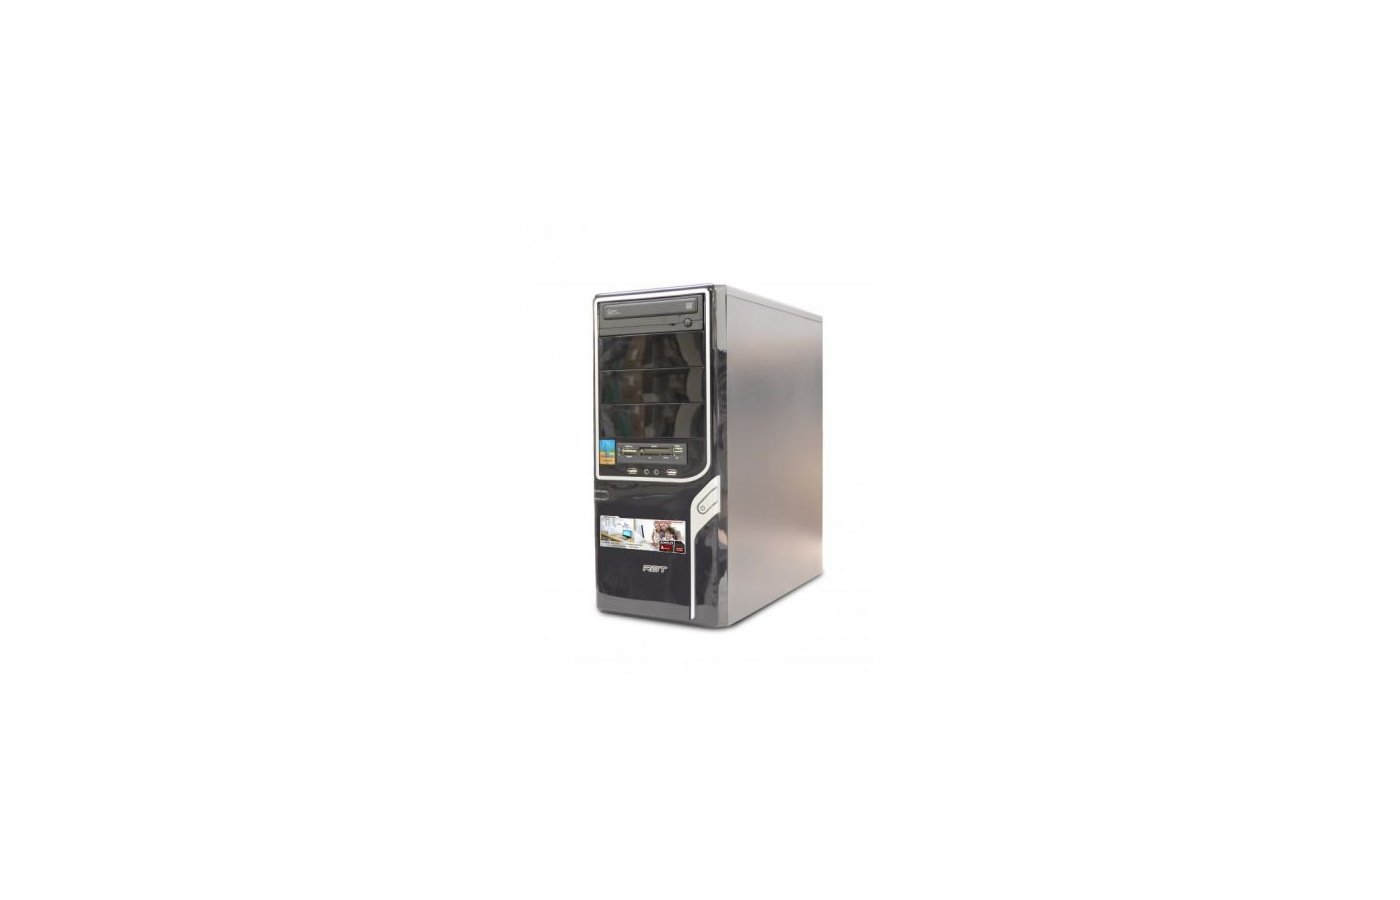 Системный блок РБТ R244 AMD X2 A4 4000 3.0Gh/4Gb/500Gb/HD 7480D/DVD-RW/CR